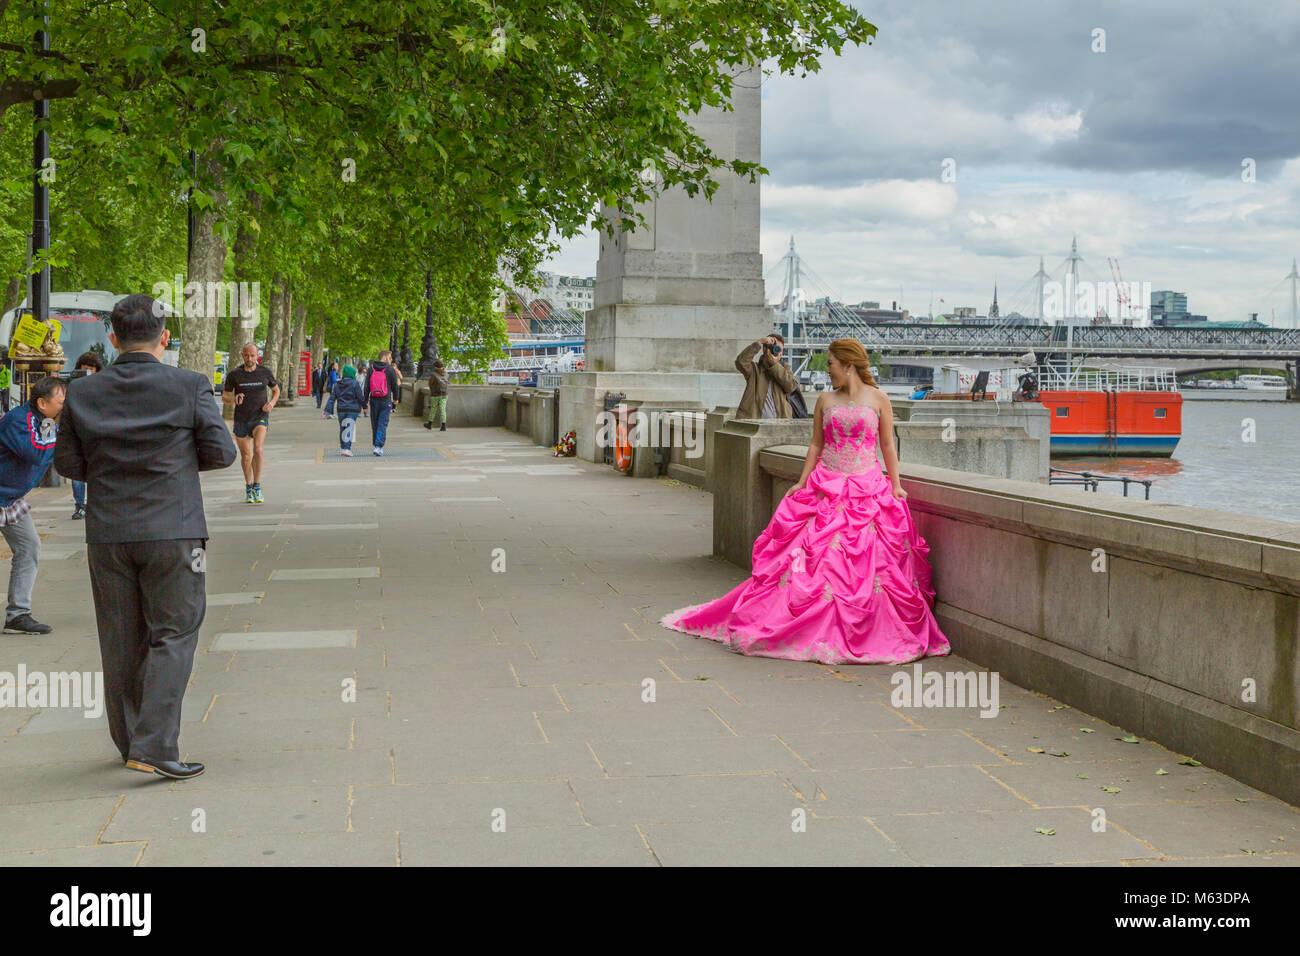 Model shoot on Victoria Embankment, London. - Stock Image